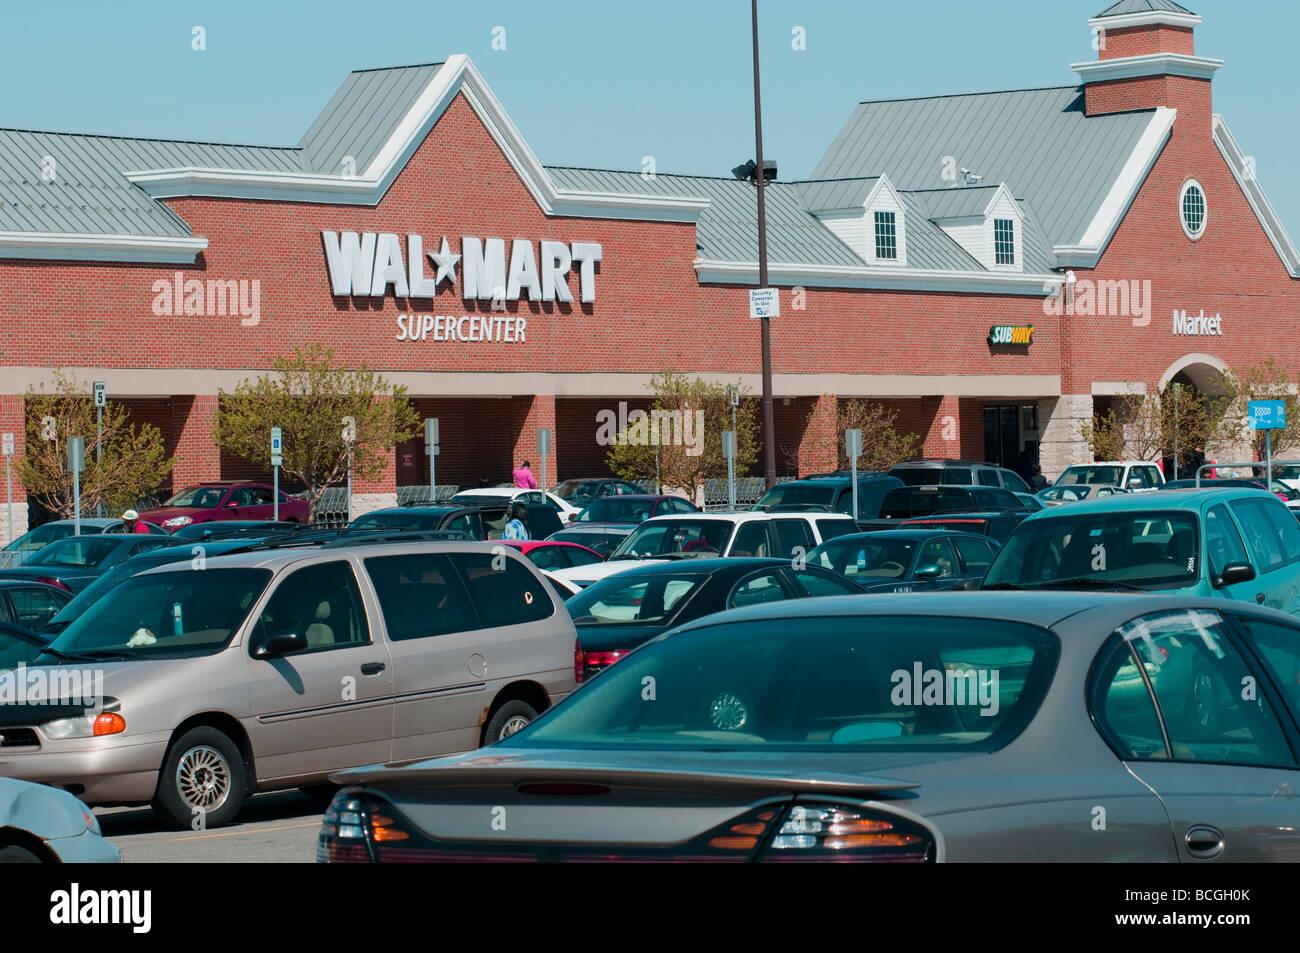 Wal Mart Canada Stock Photos & Wal Mart Canada Stock Images - Alamy